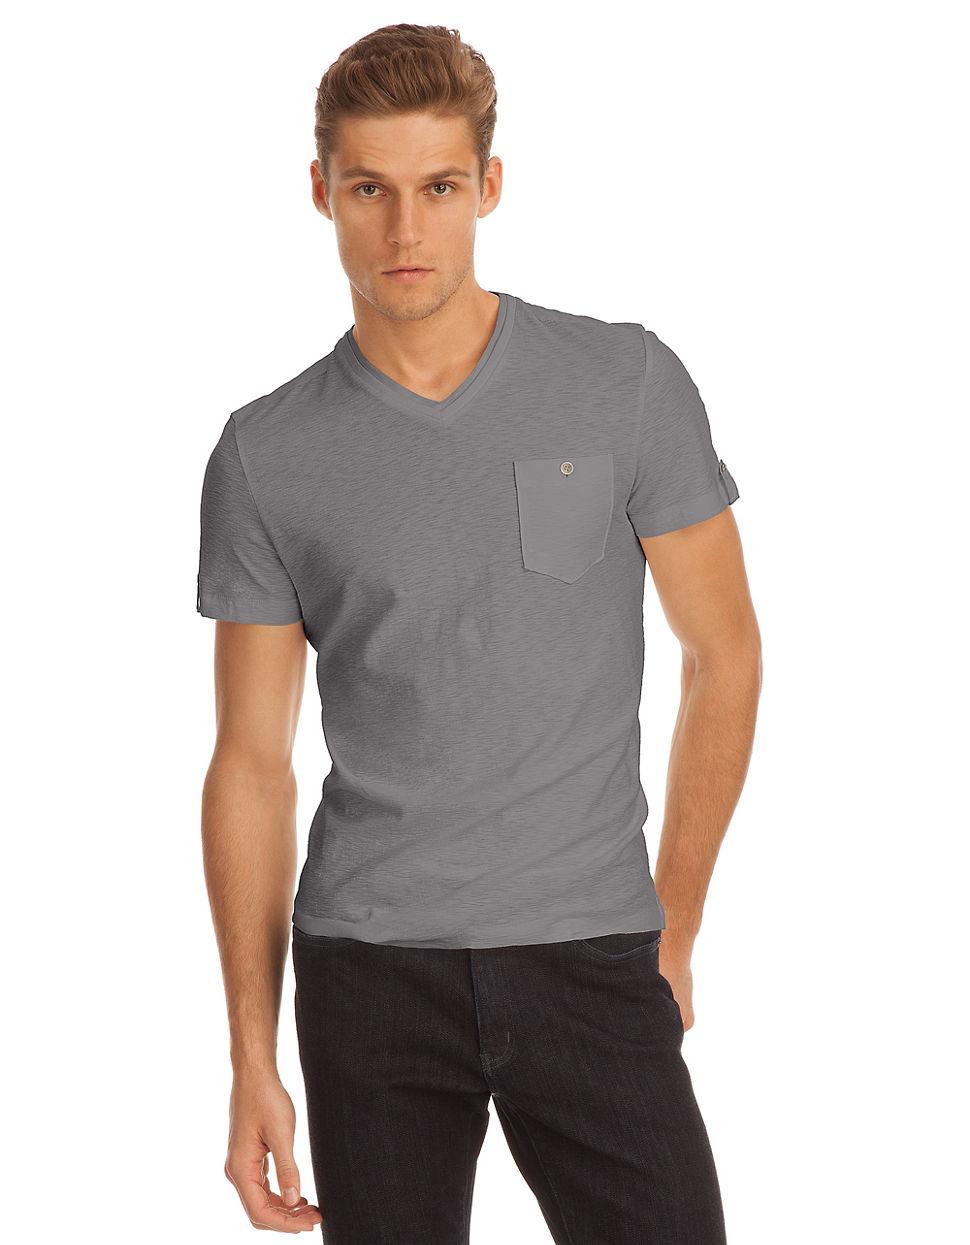 Kenneth cole v neck pocket t shirt in gray for men grey for Men s v neck pocket tee shirts